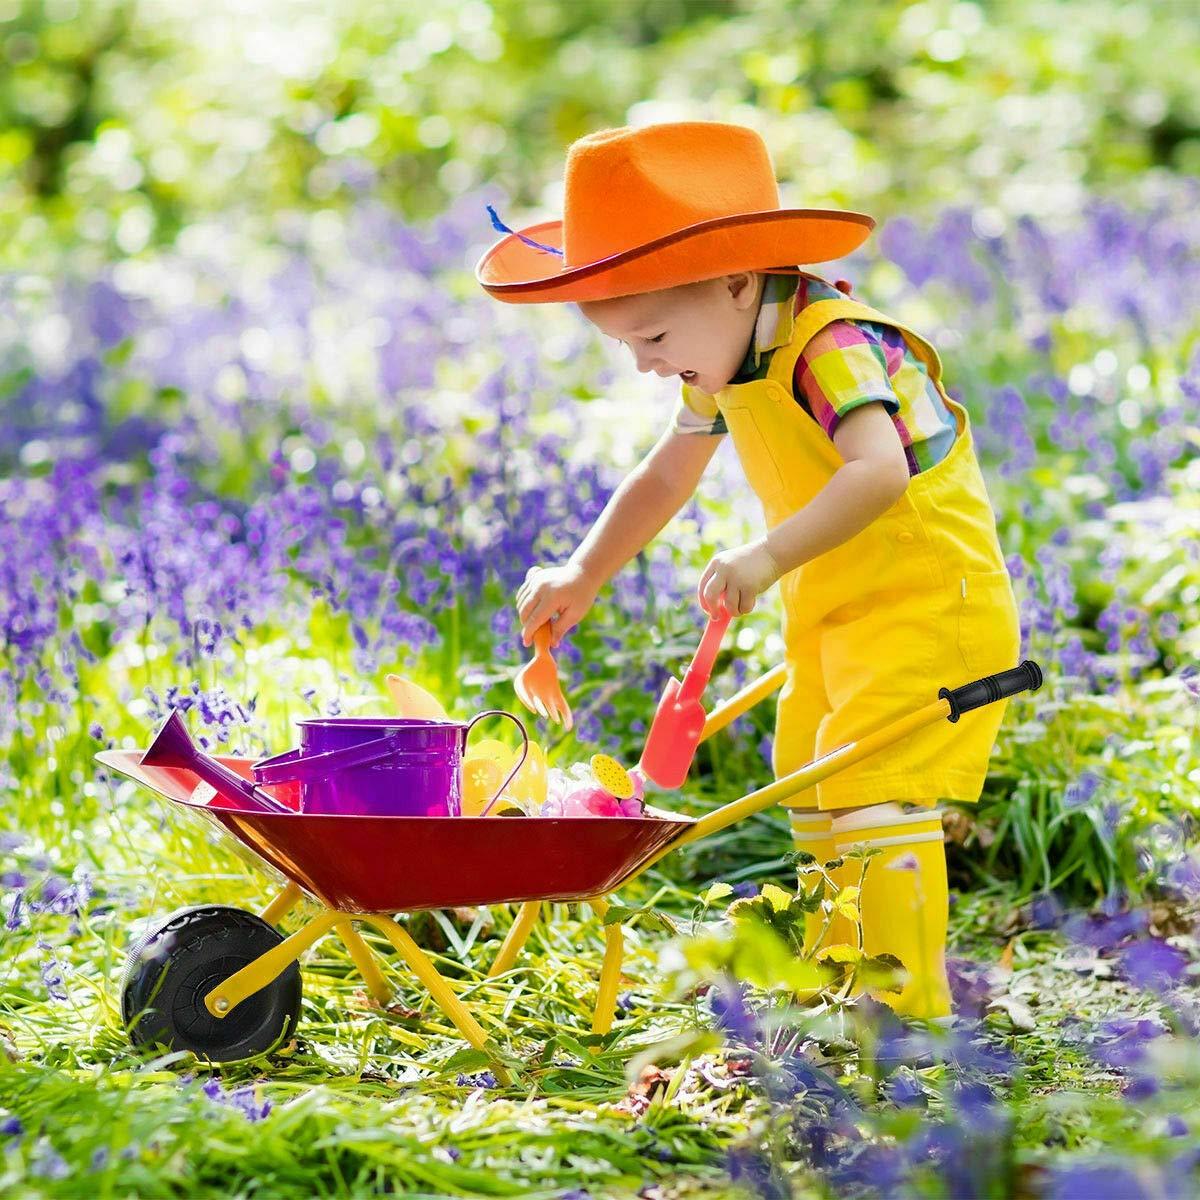 Heize best price Red Kids Metal Wheelbarrow Children's Size Outdoor Garden Backyard Play Toy by Heize best price (Image #5)